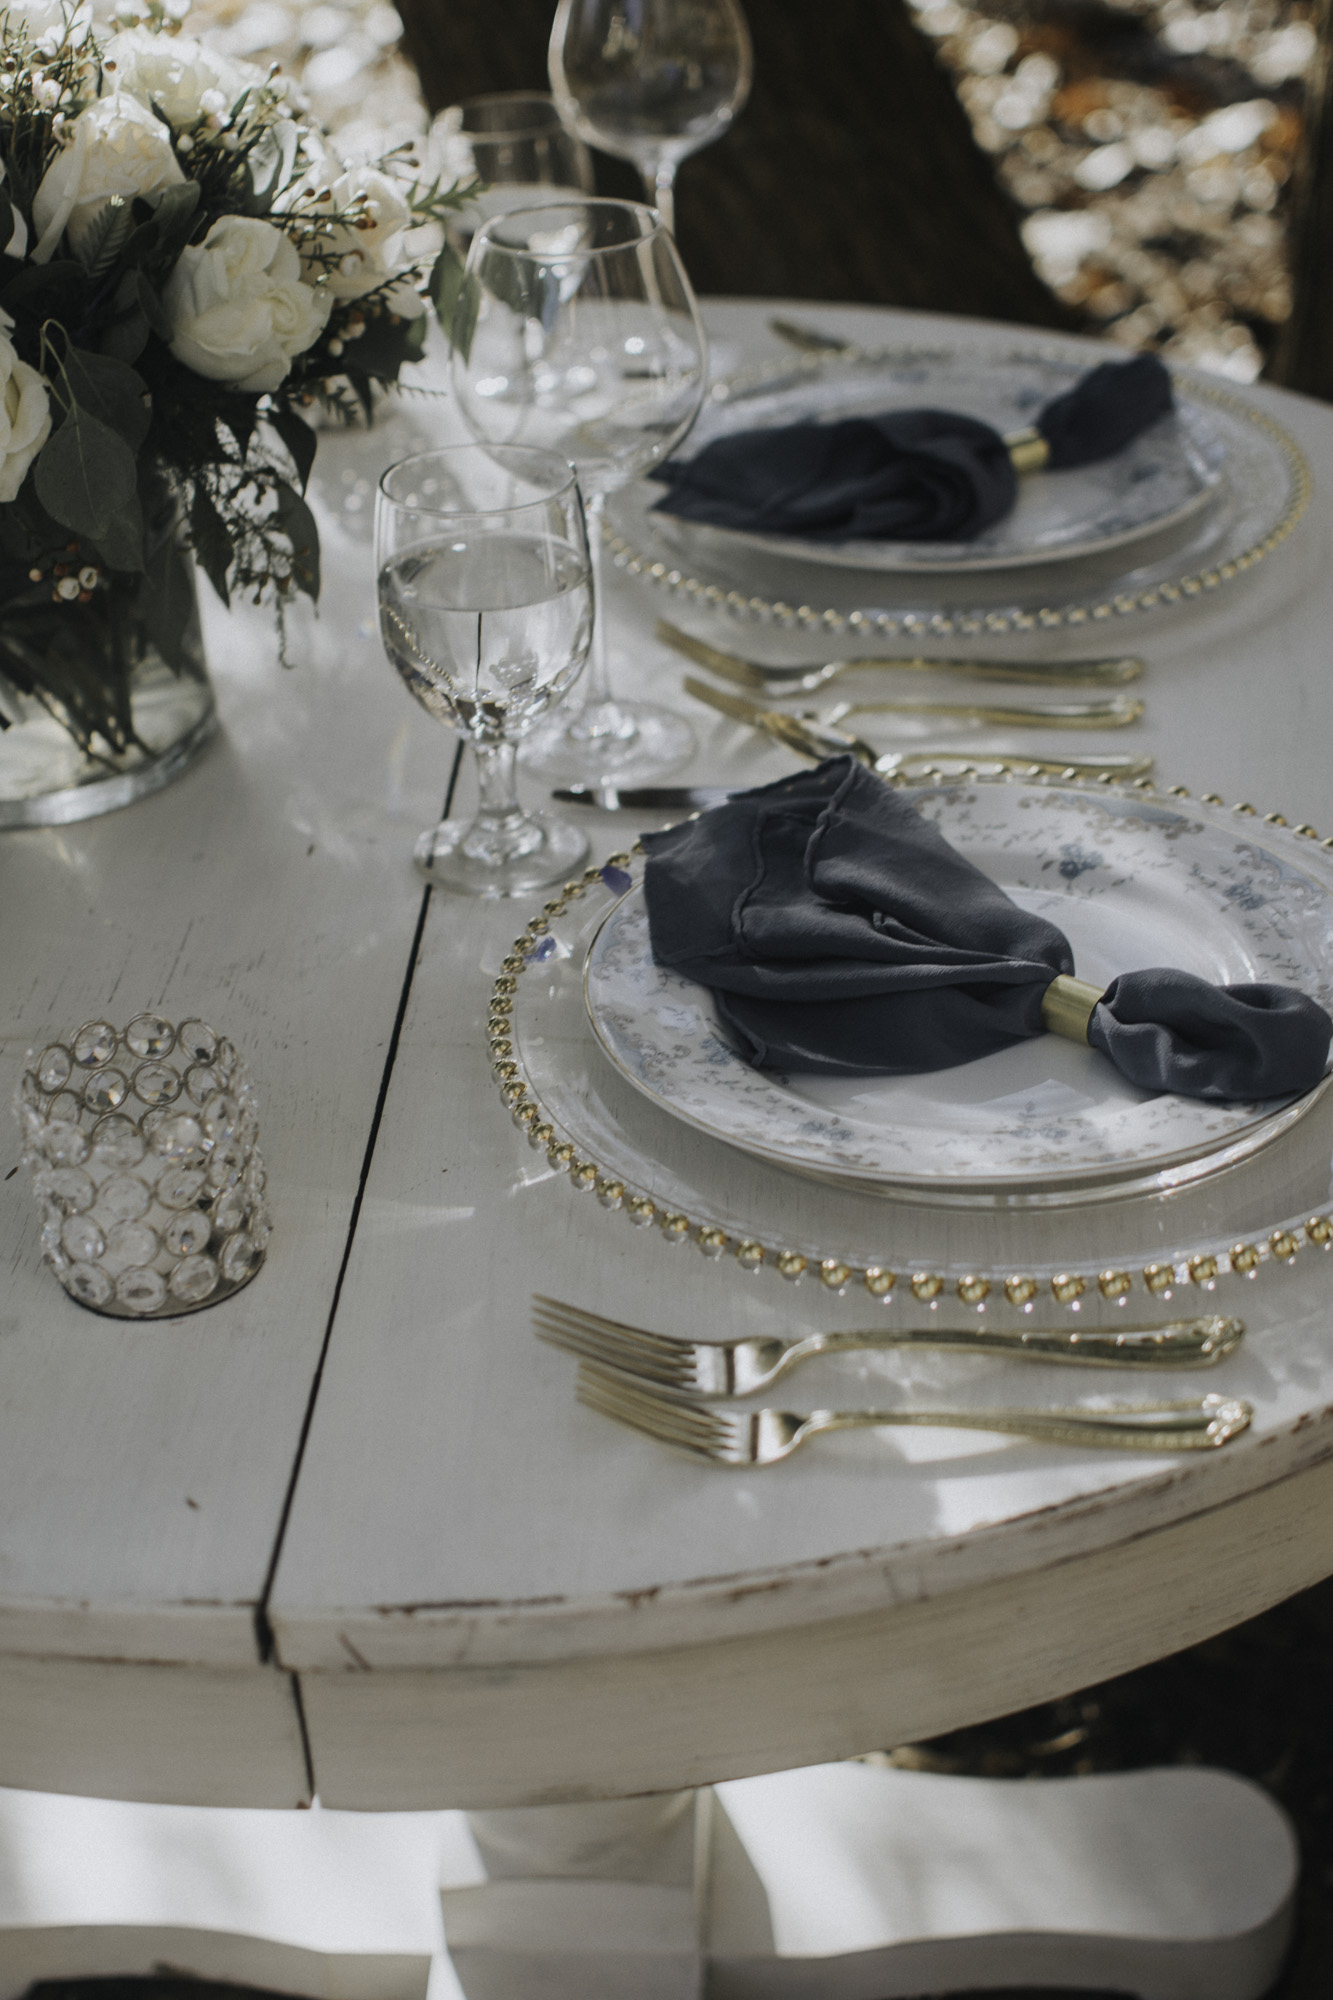 Cate_Ann_Photography_Dayton_Ohio_Wedding_Elopement_And_Engagement_PhotographerDSC_5816.jpg